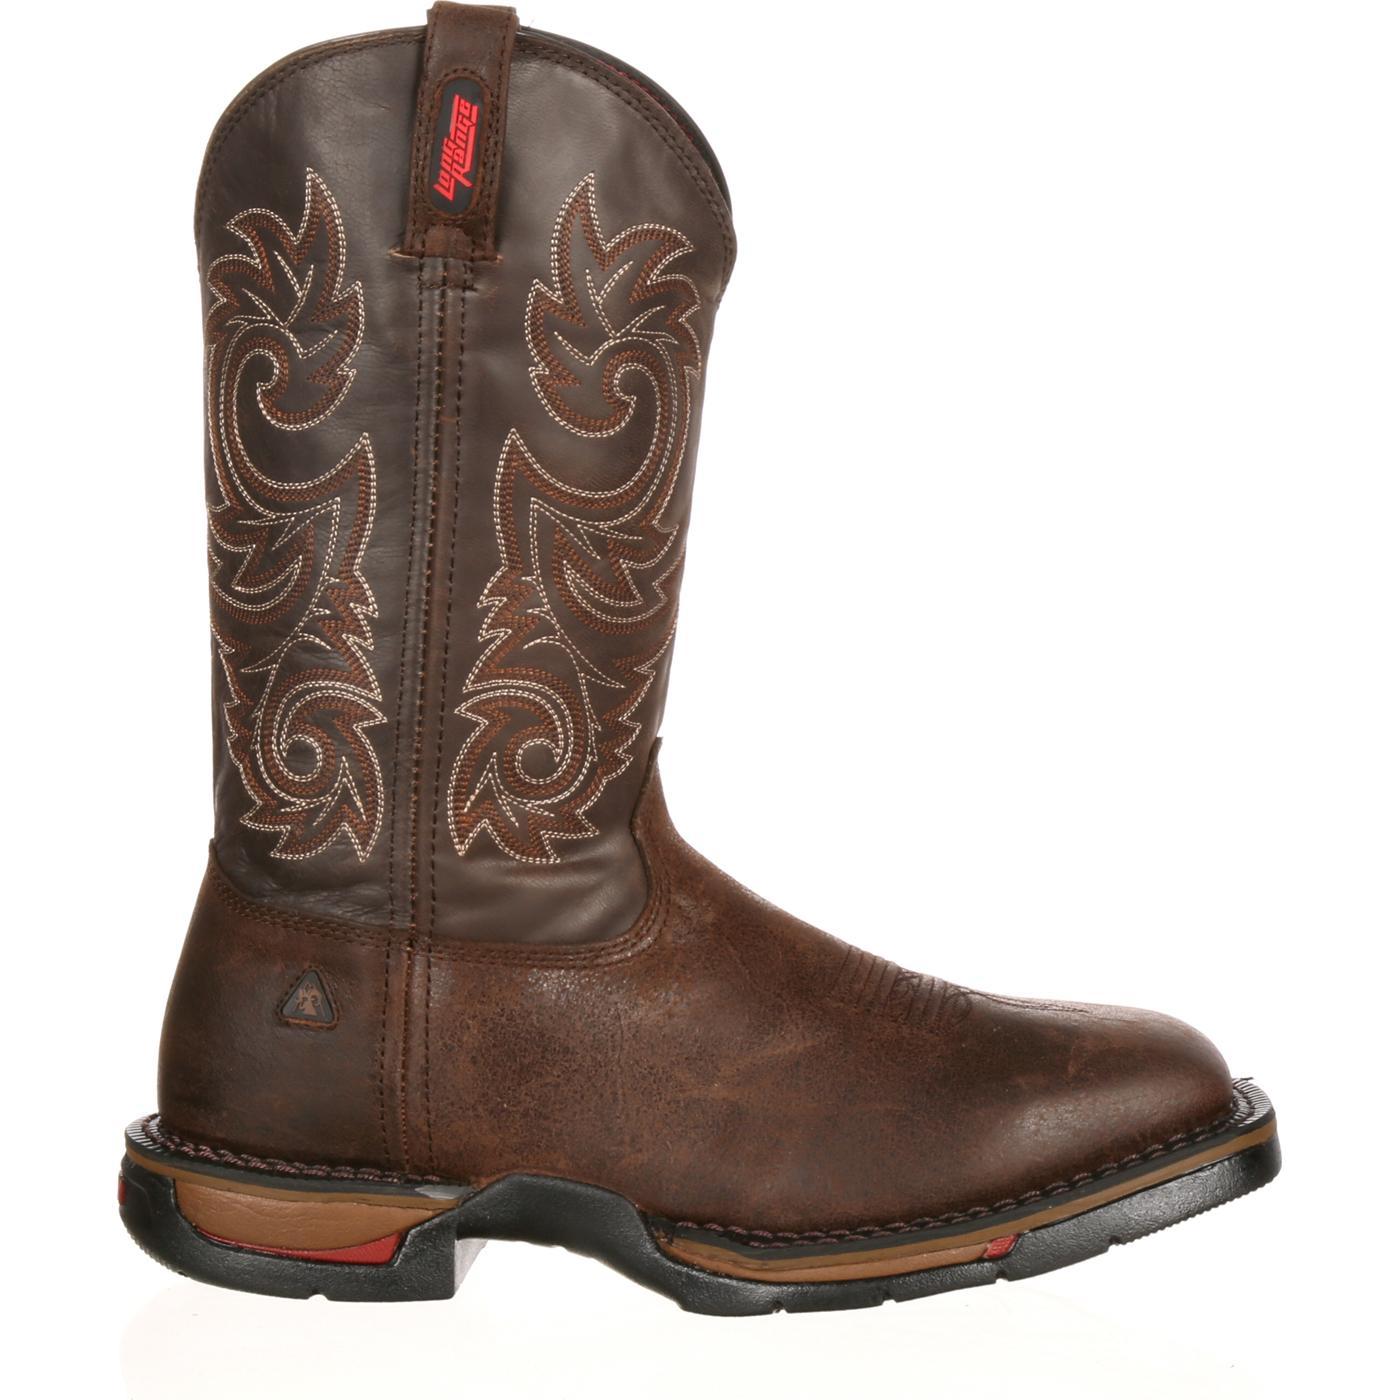 rocky range s comfortable western work boots